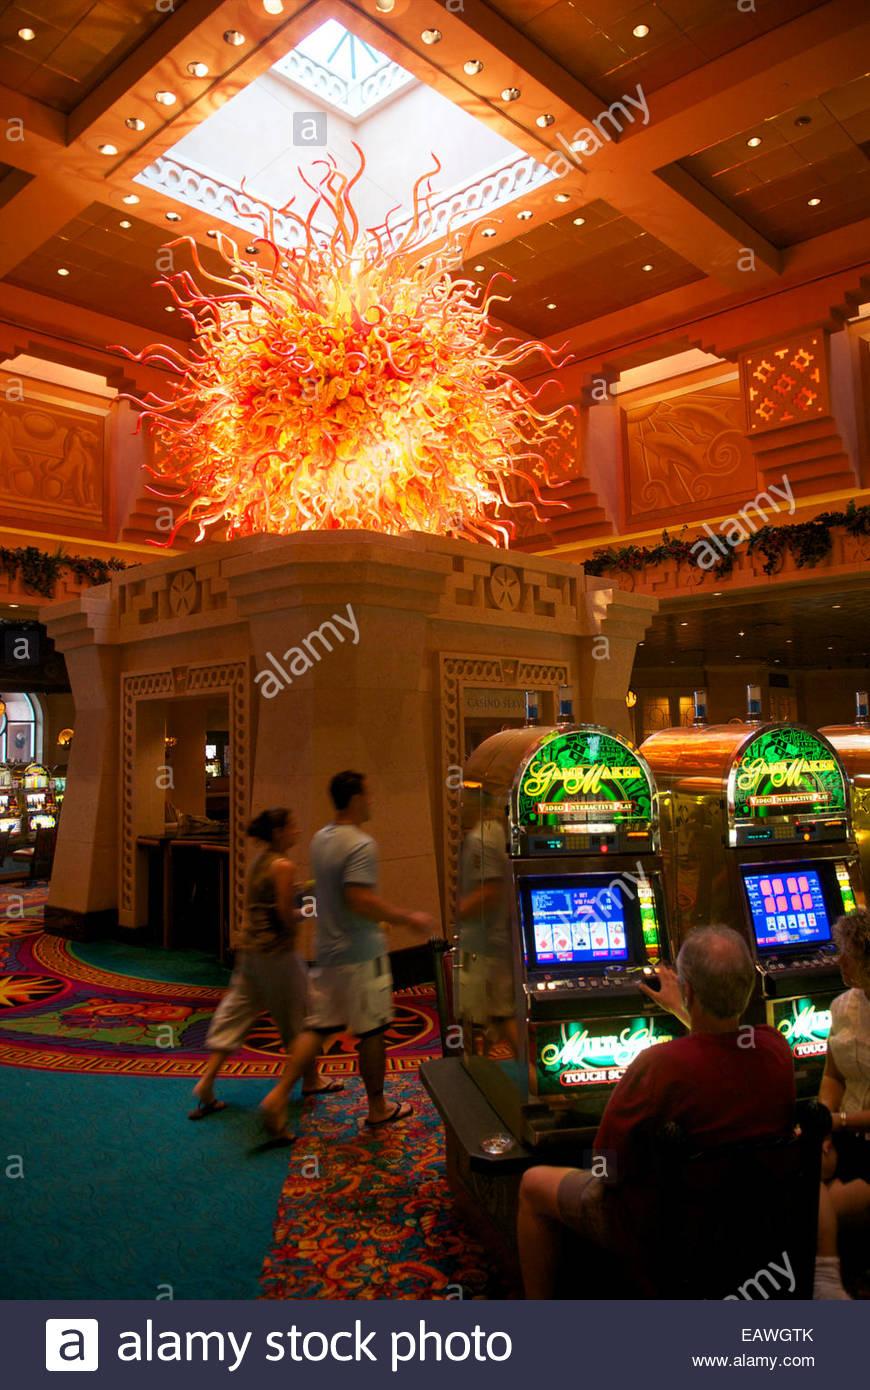 Www atlantiscasino com bus to tulalip casino